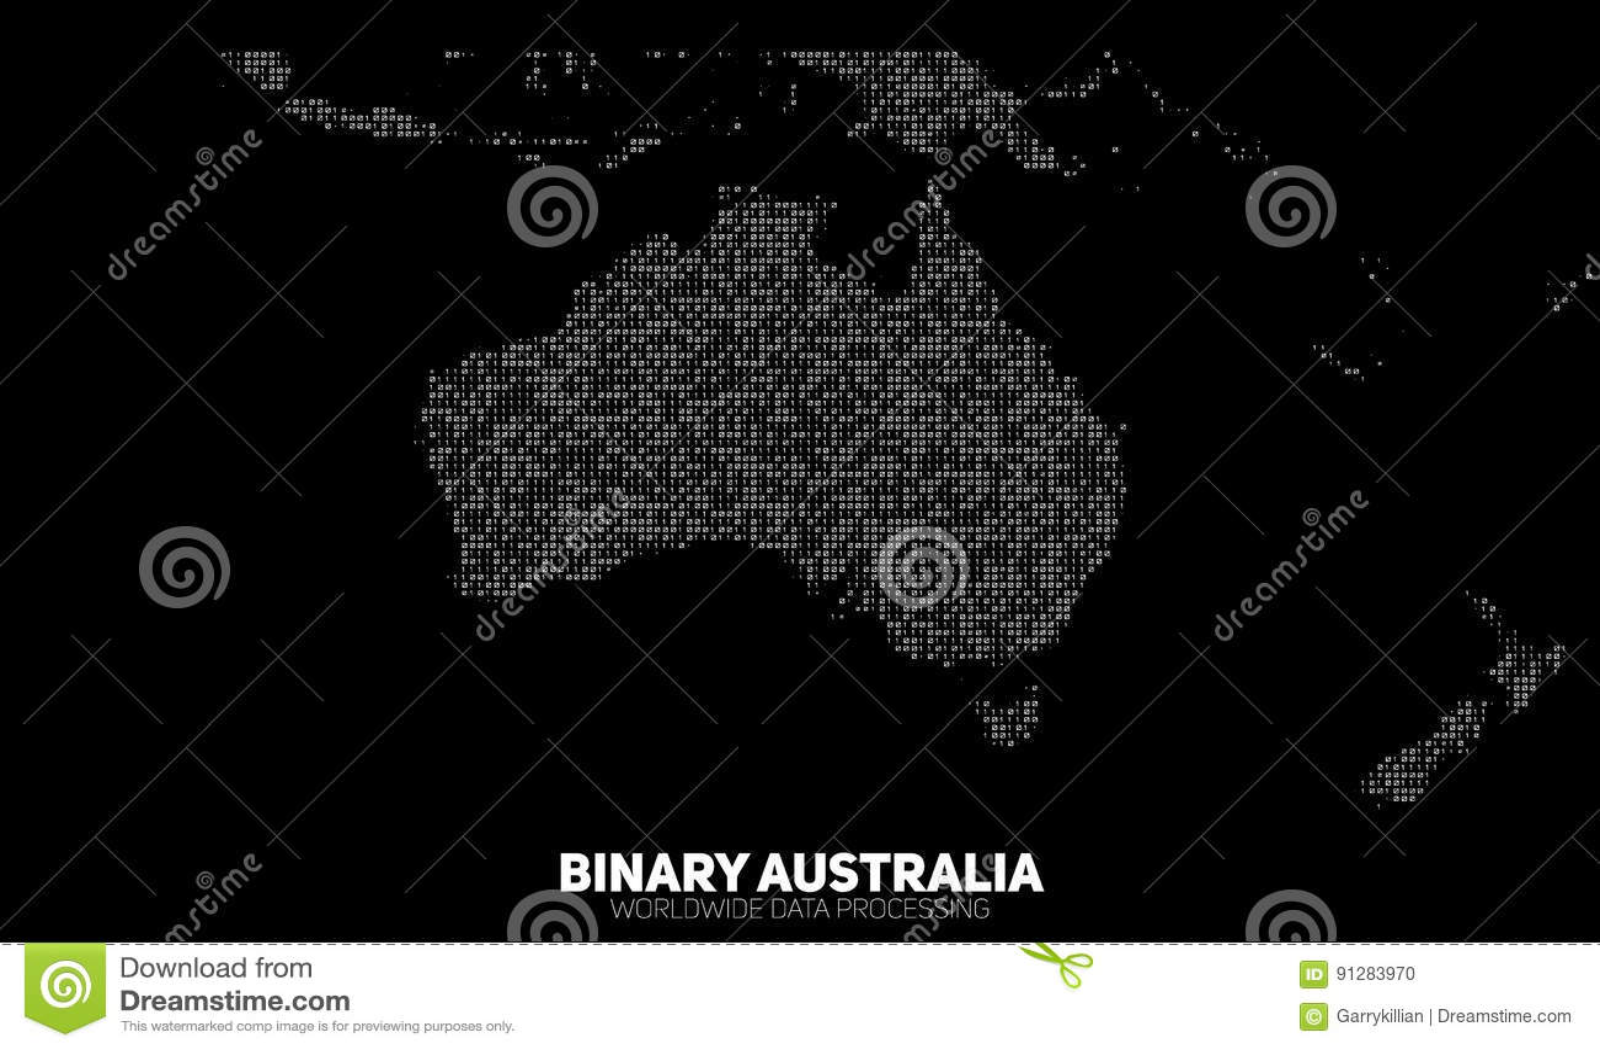 Mapa binario abstracto de Australia del vector Continentes construidos de números binarios Red de información global